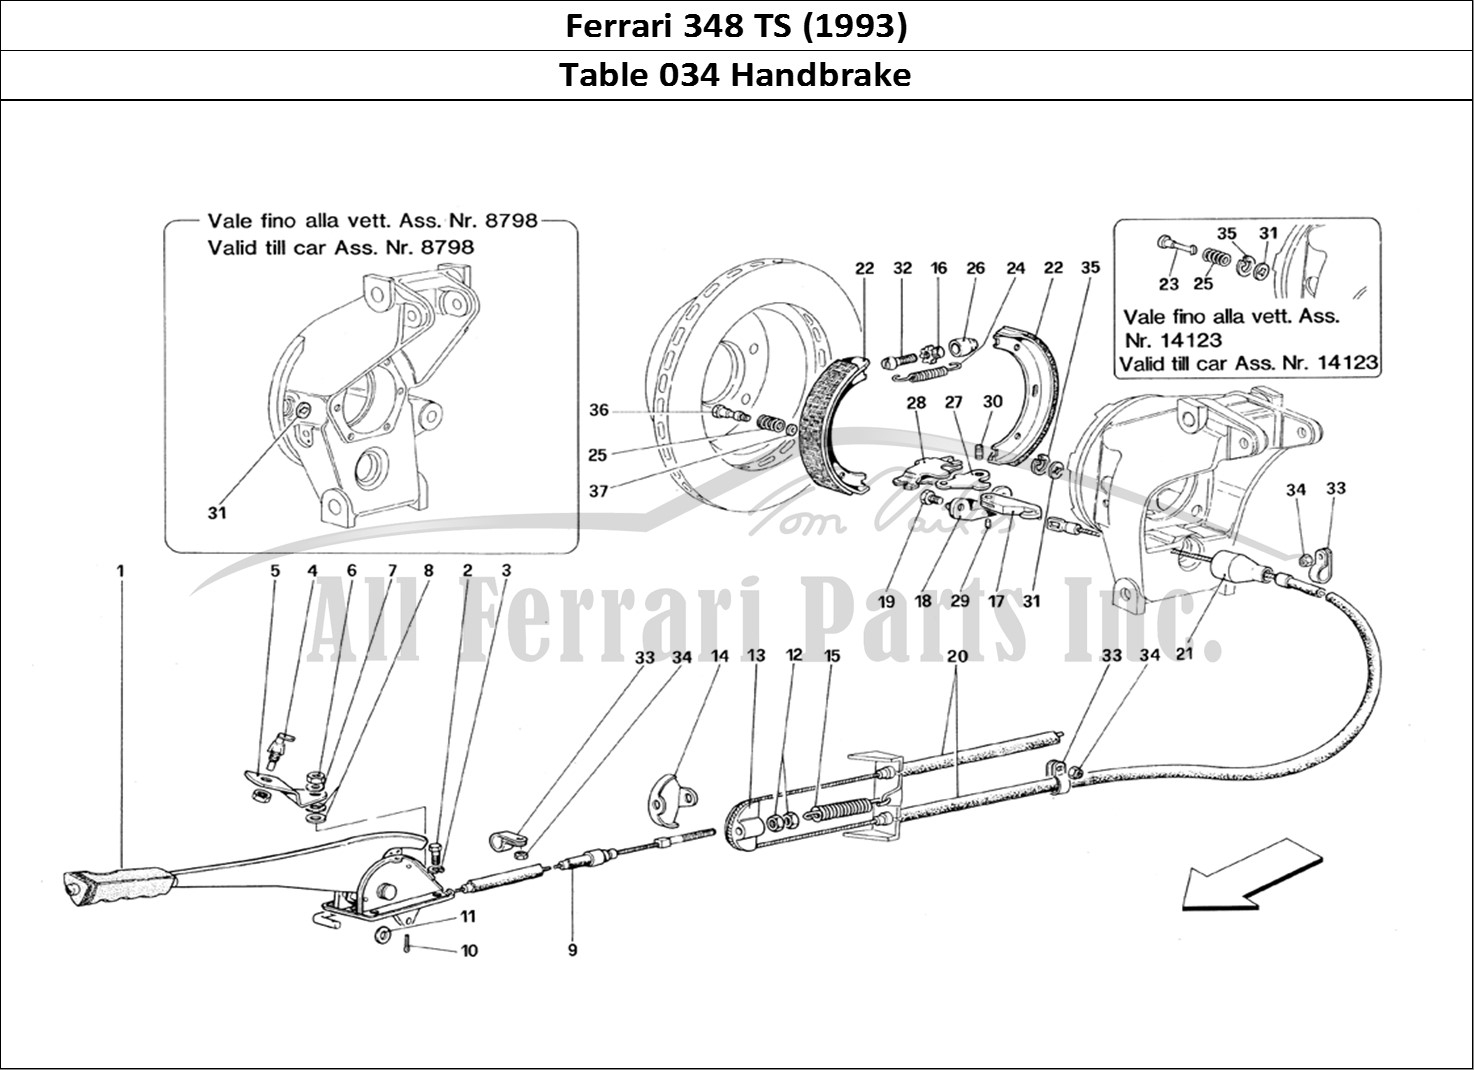 Buy original Ferrari 348 TS (1993) 034 Handbrake Ferrari